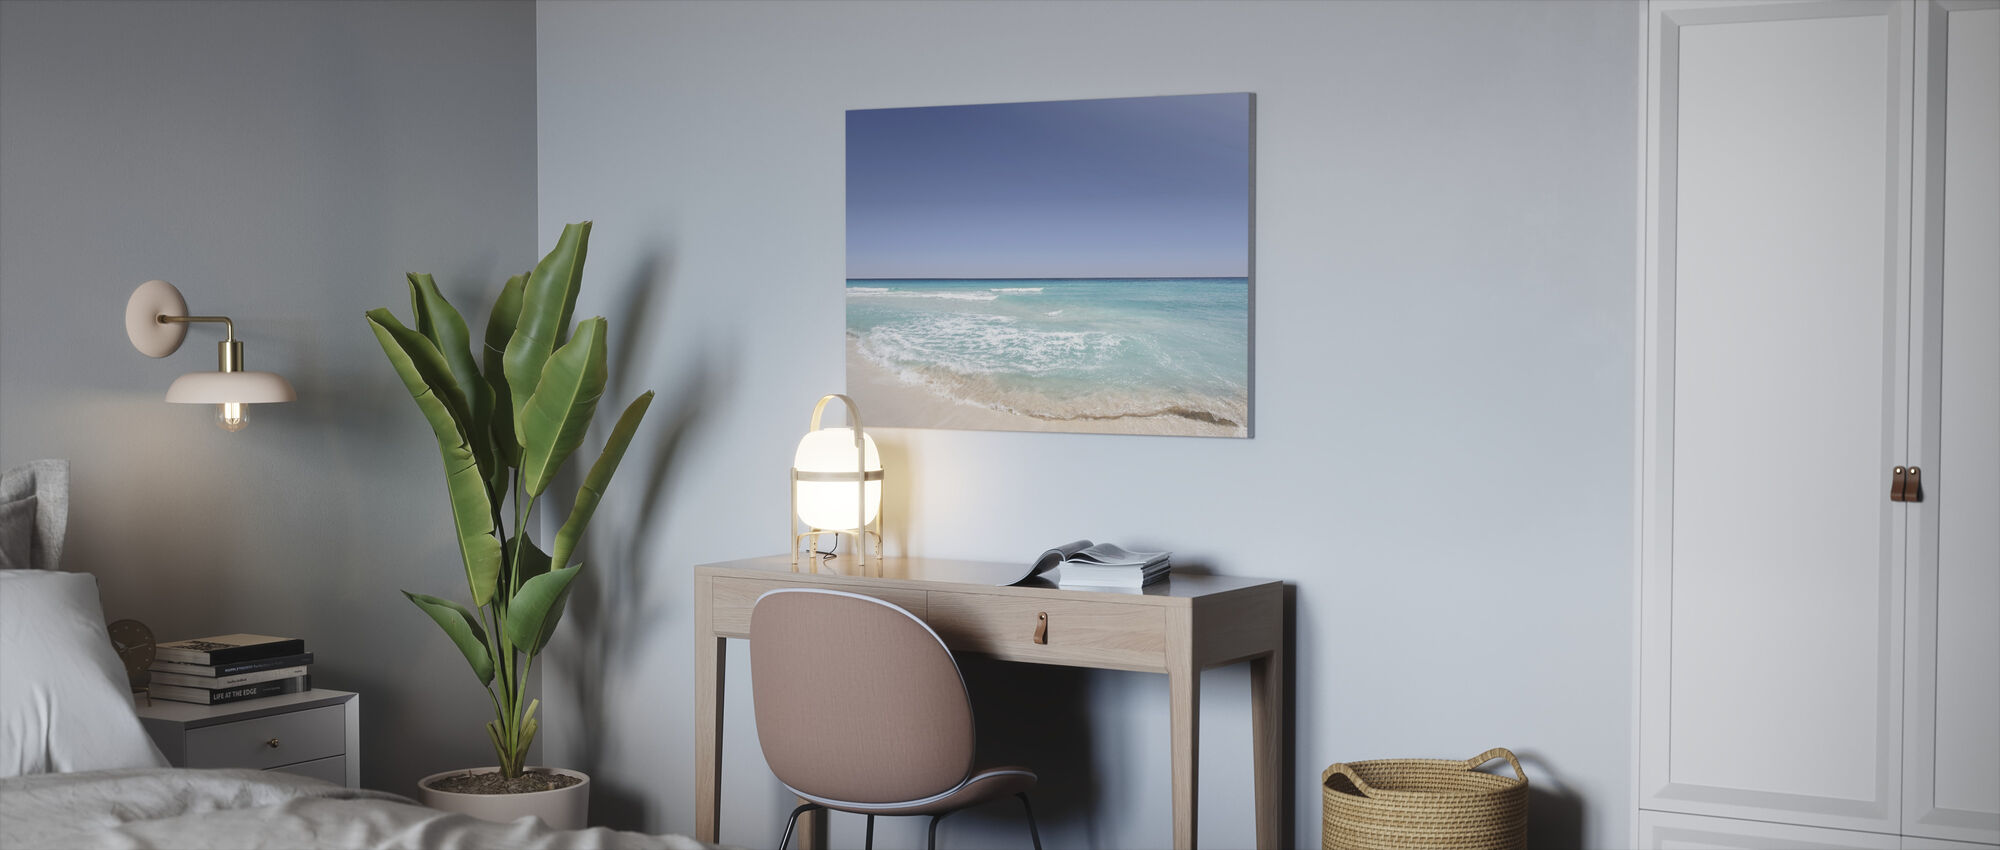 Strand Shore - Lerretsbilde - Kontor